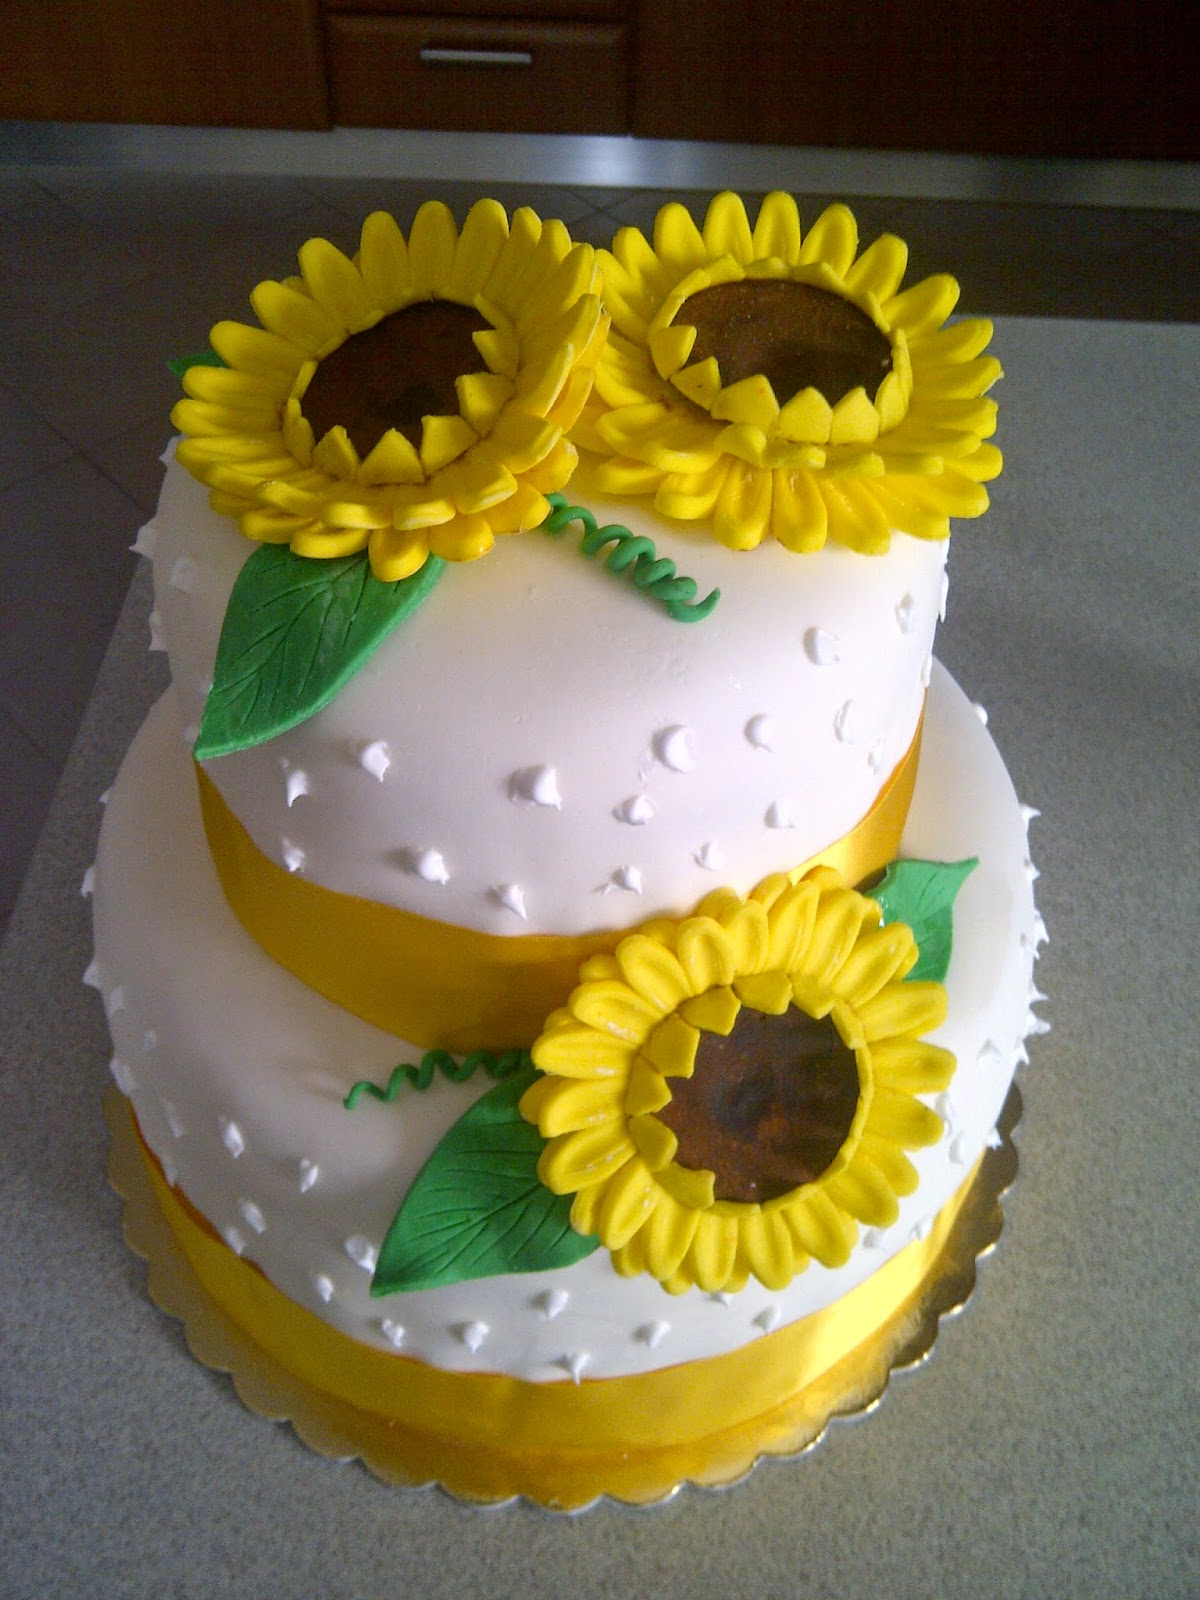 Torta Matrimonio Girasoli : Art sugar crystals torta pdz con girasoli